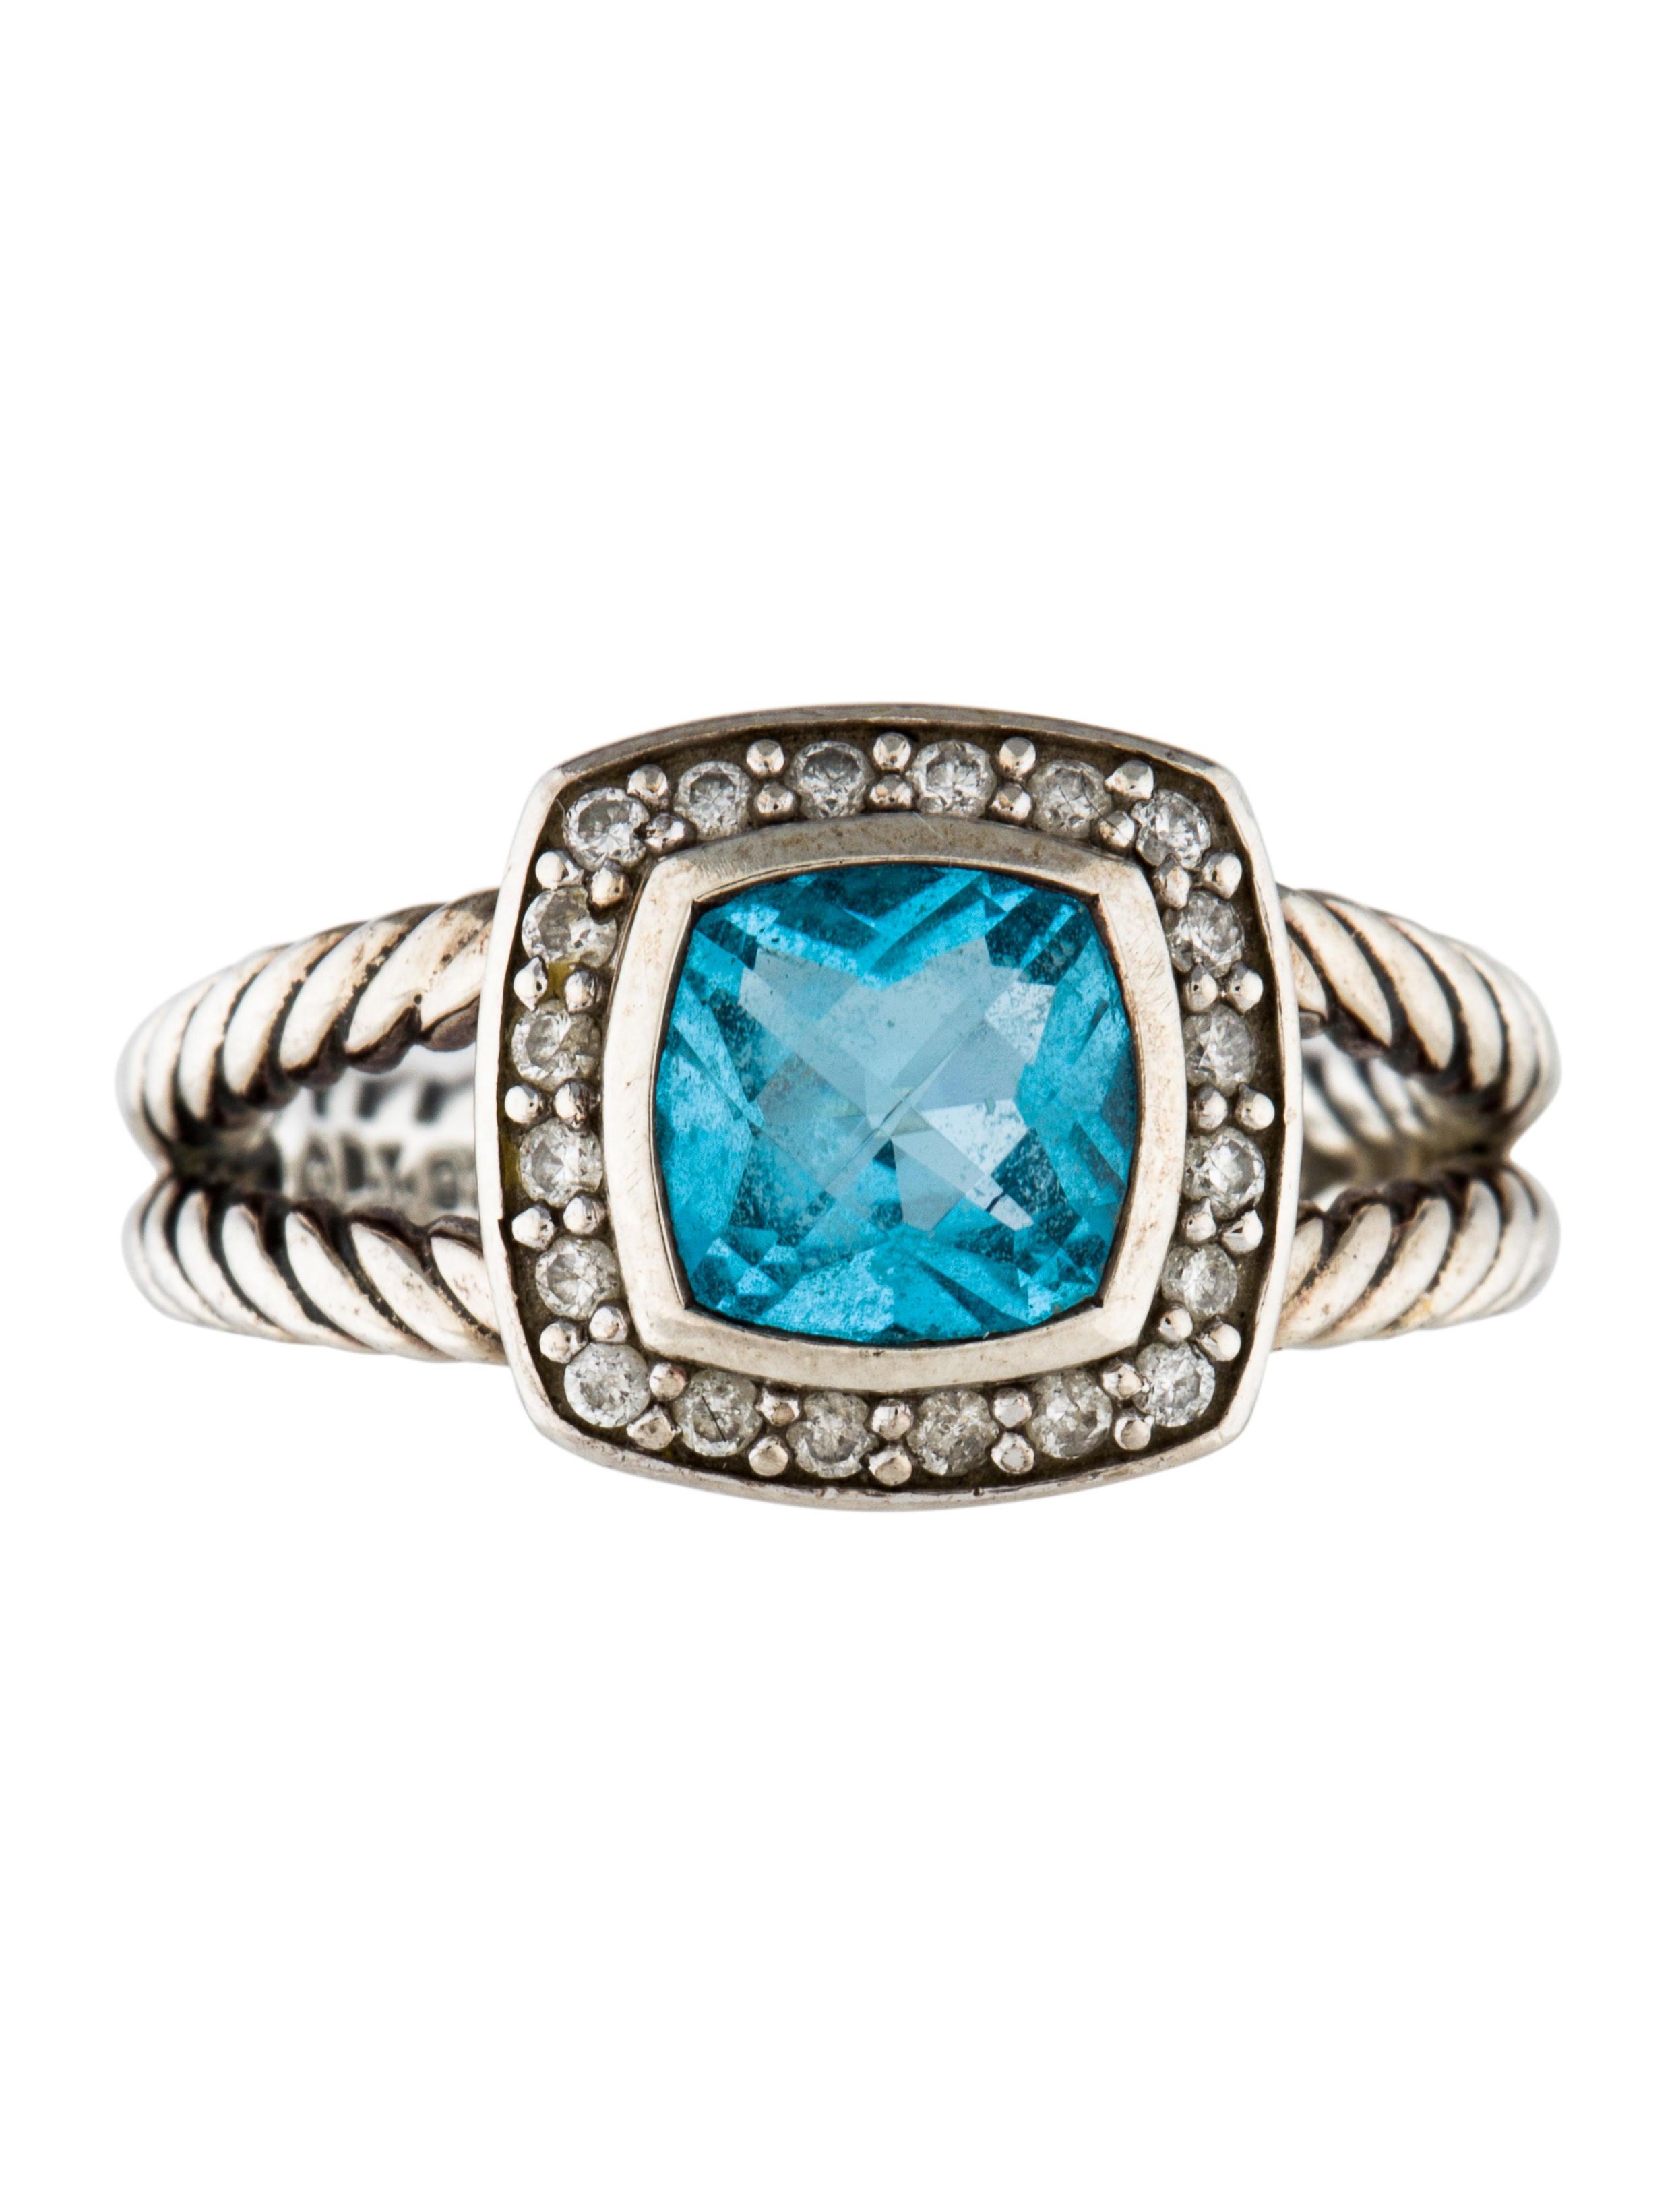 David yurman topaz diamond petite albion ring rings for David yurman inspired jewelry rings